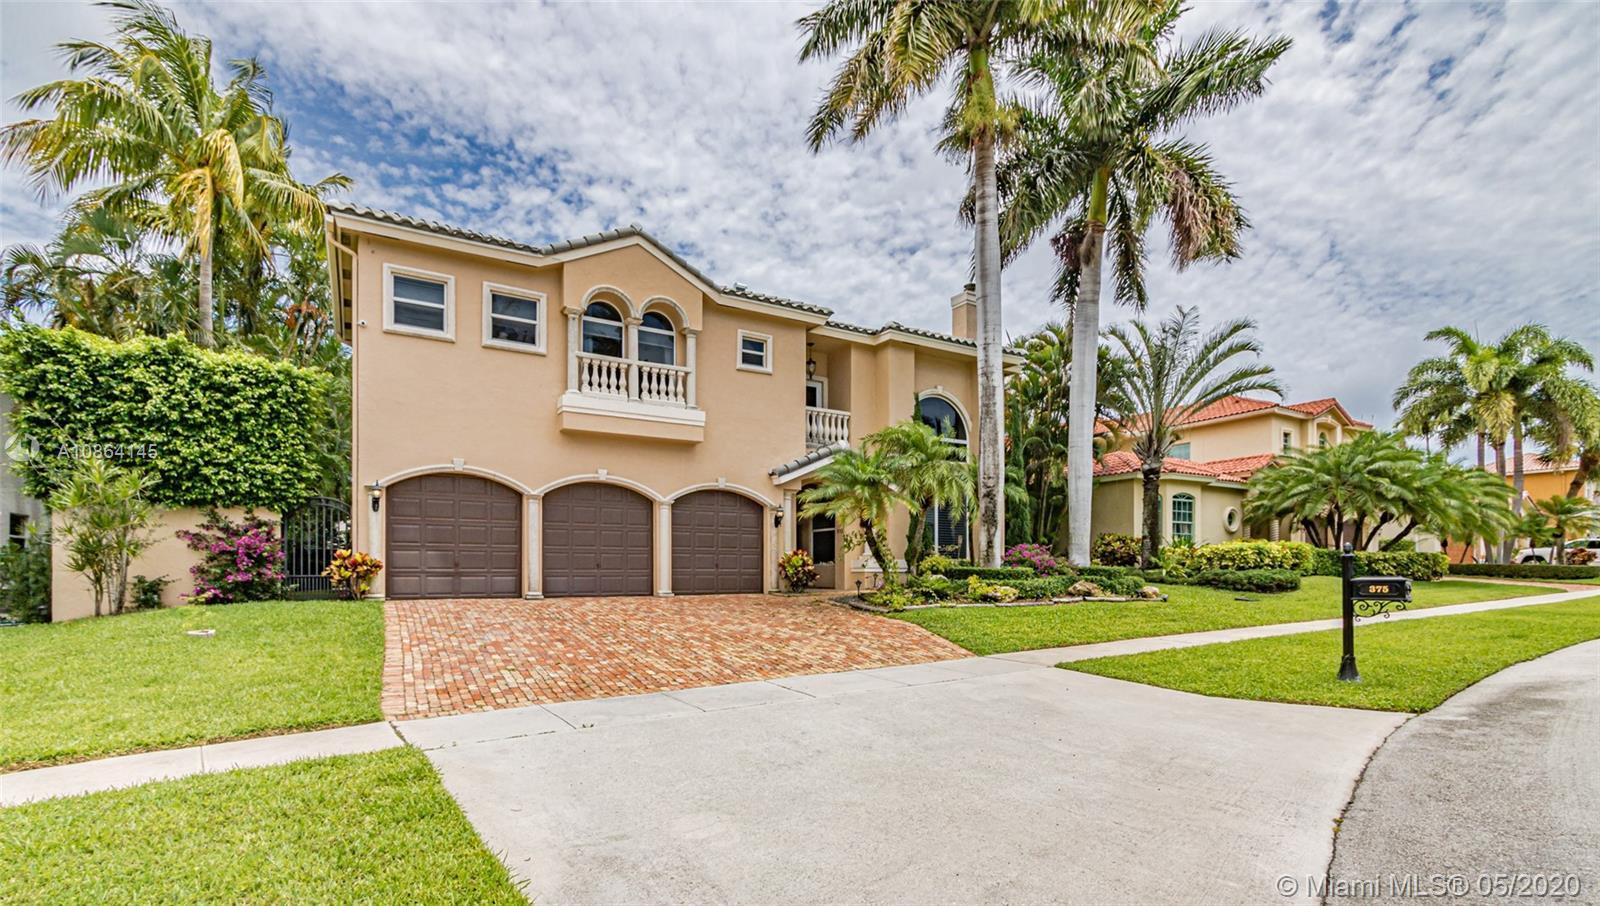 375 SW 16th St Property Photo - Boca Raton, FL real estate listing